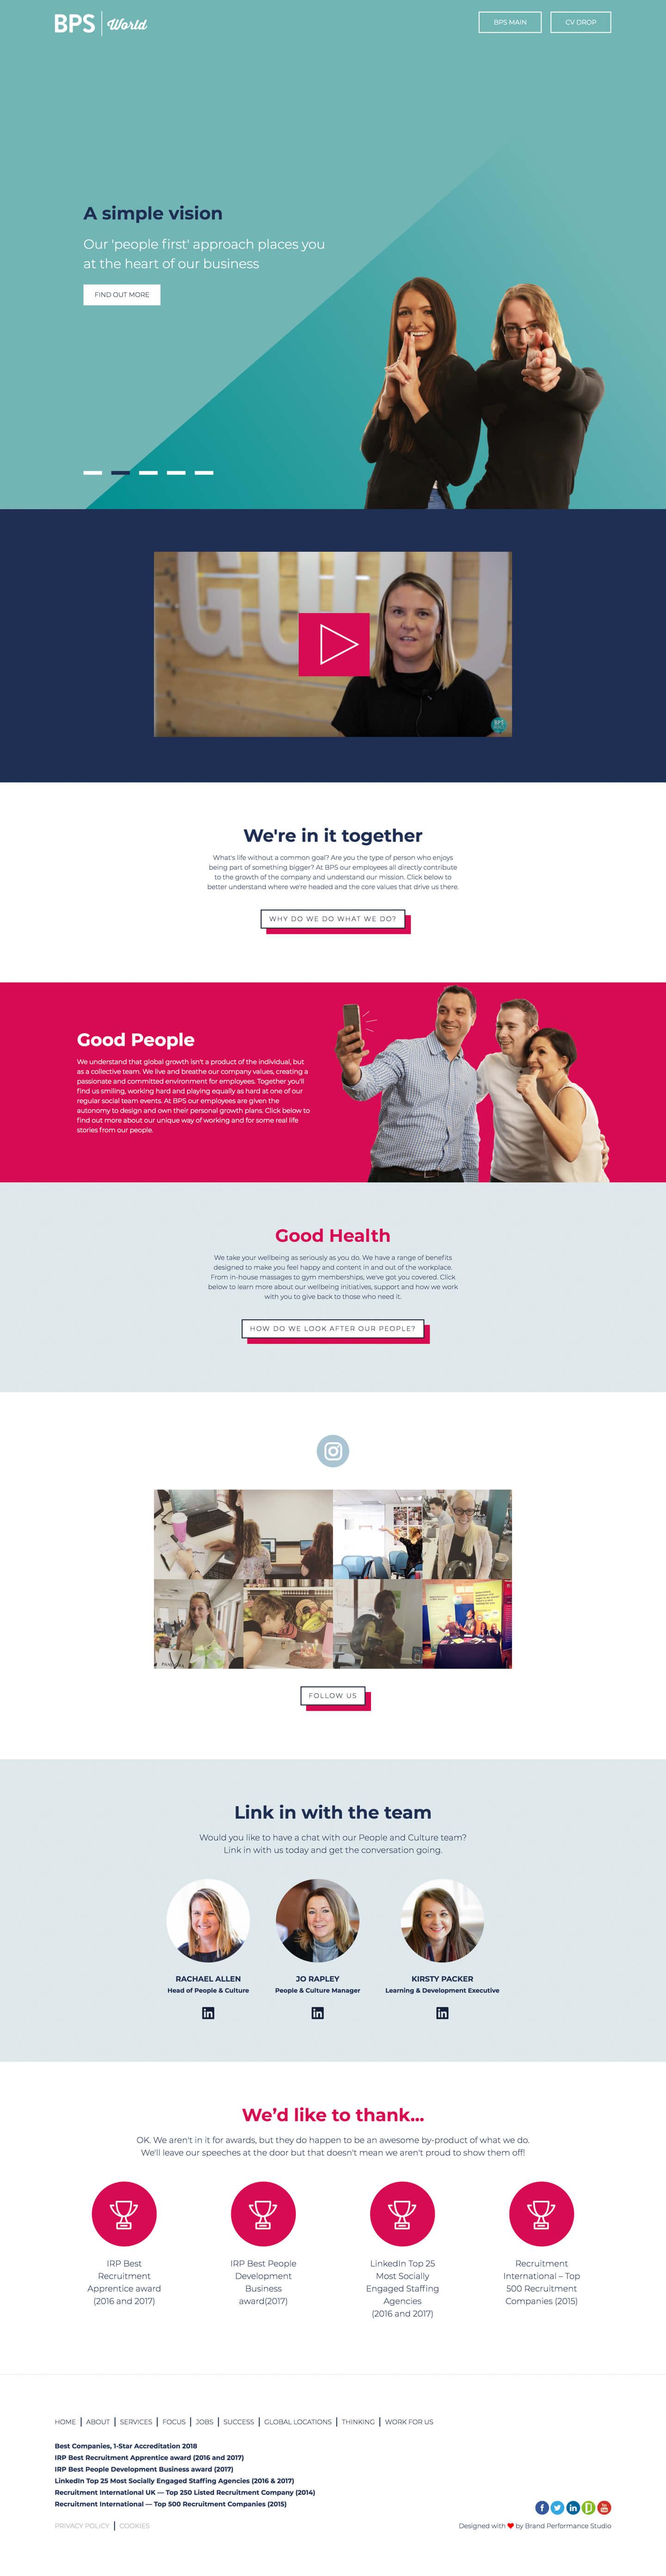 Site Page |  BPS-World Ltd. - Screenshot